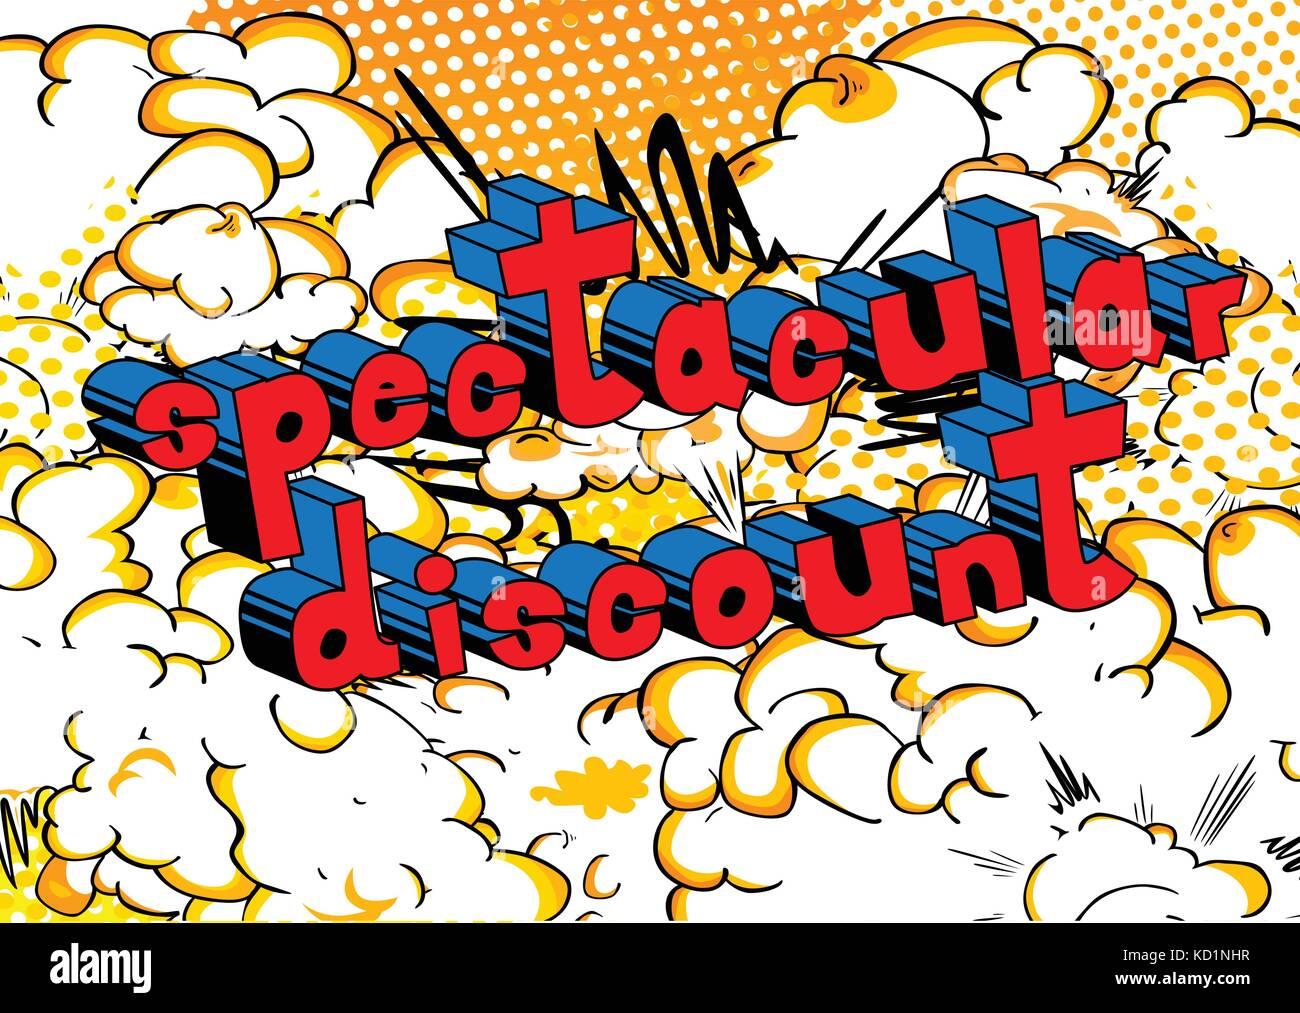 Pop Art Comic Sale Discount Stockfotos & Pop Art Comic Sale Discount ...